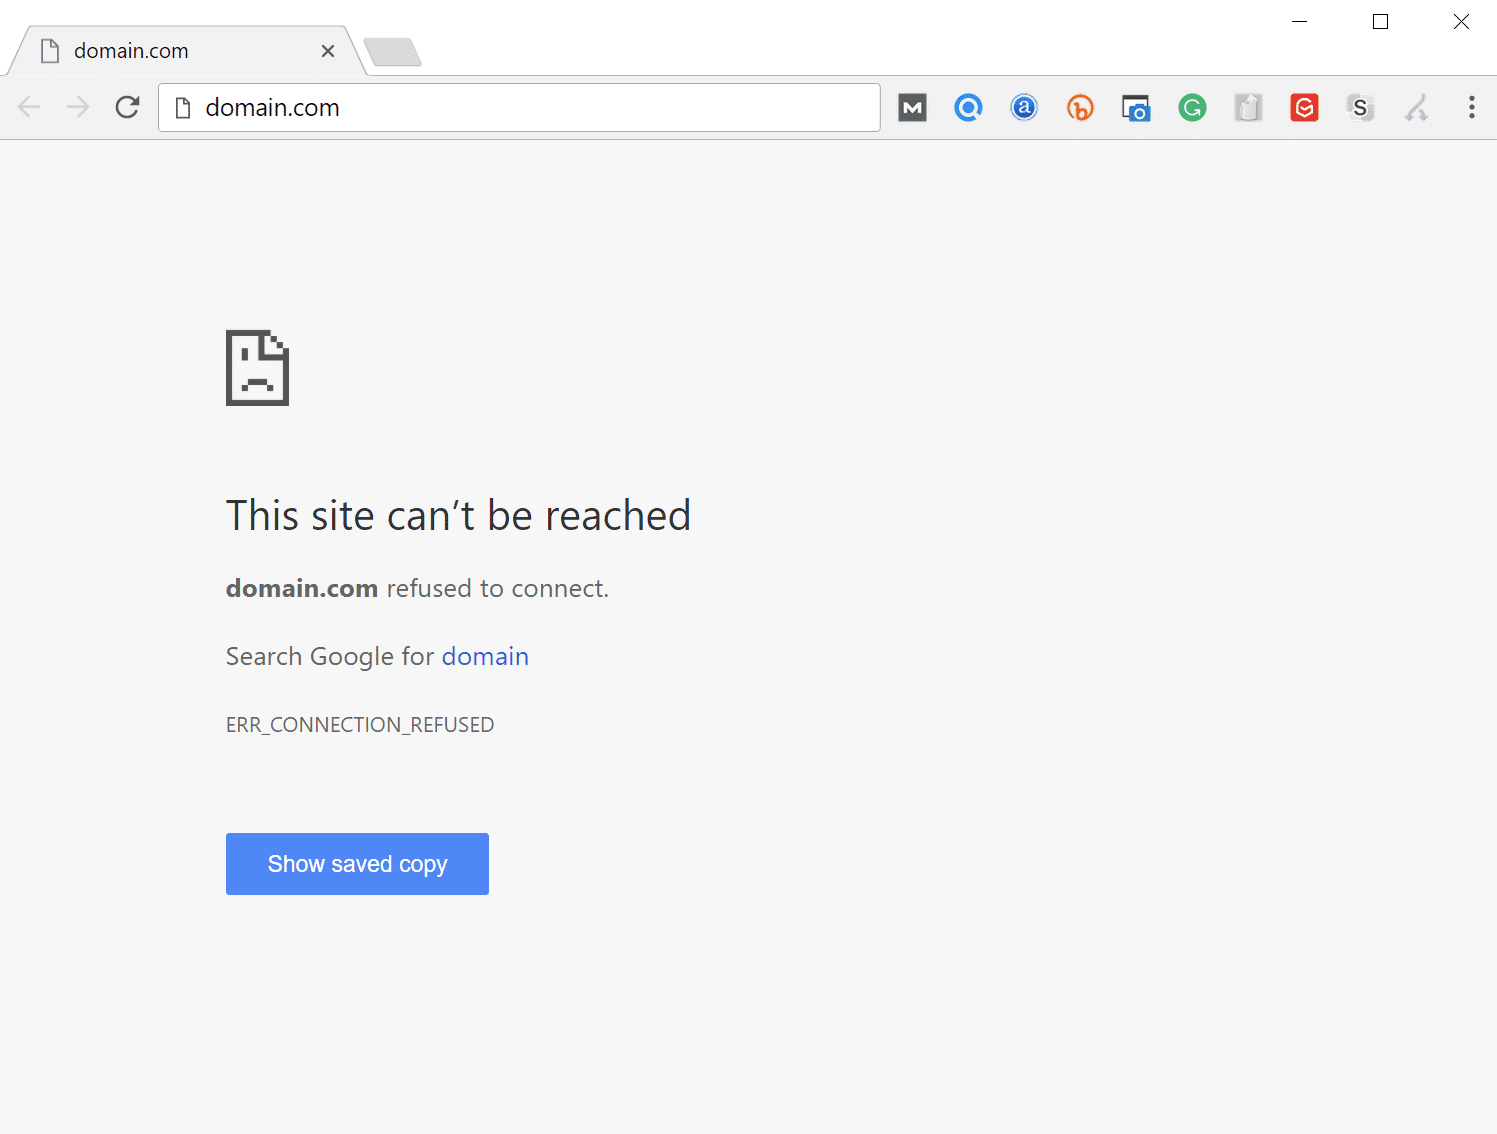 NET::ERR_CONNECTION_REFUSED Error